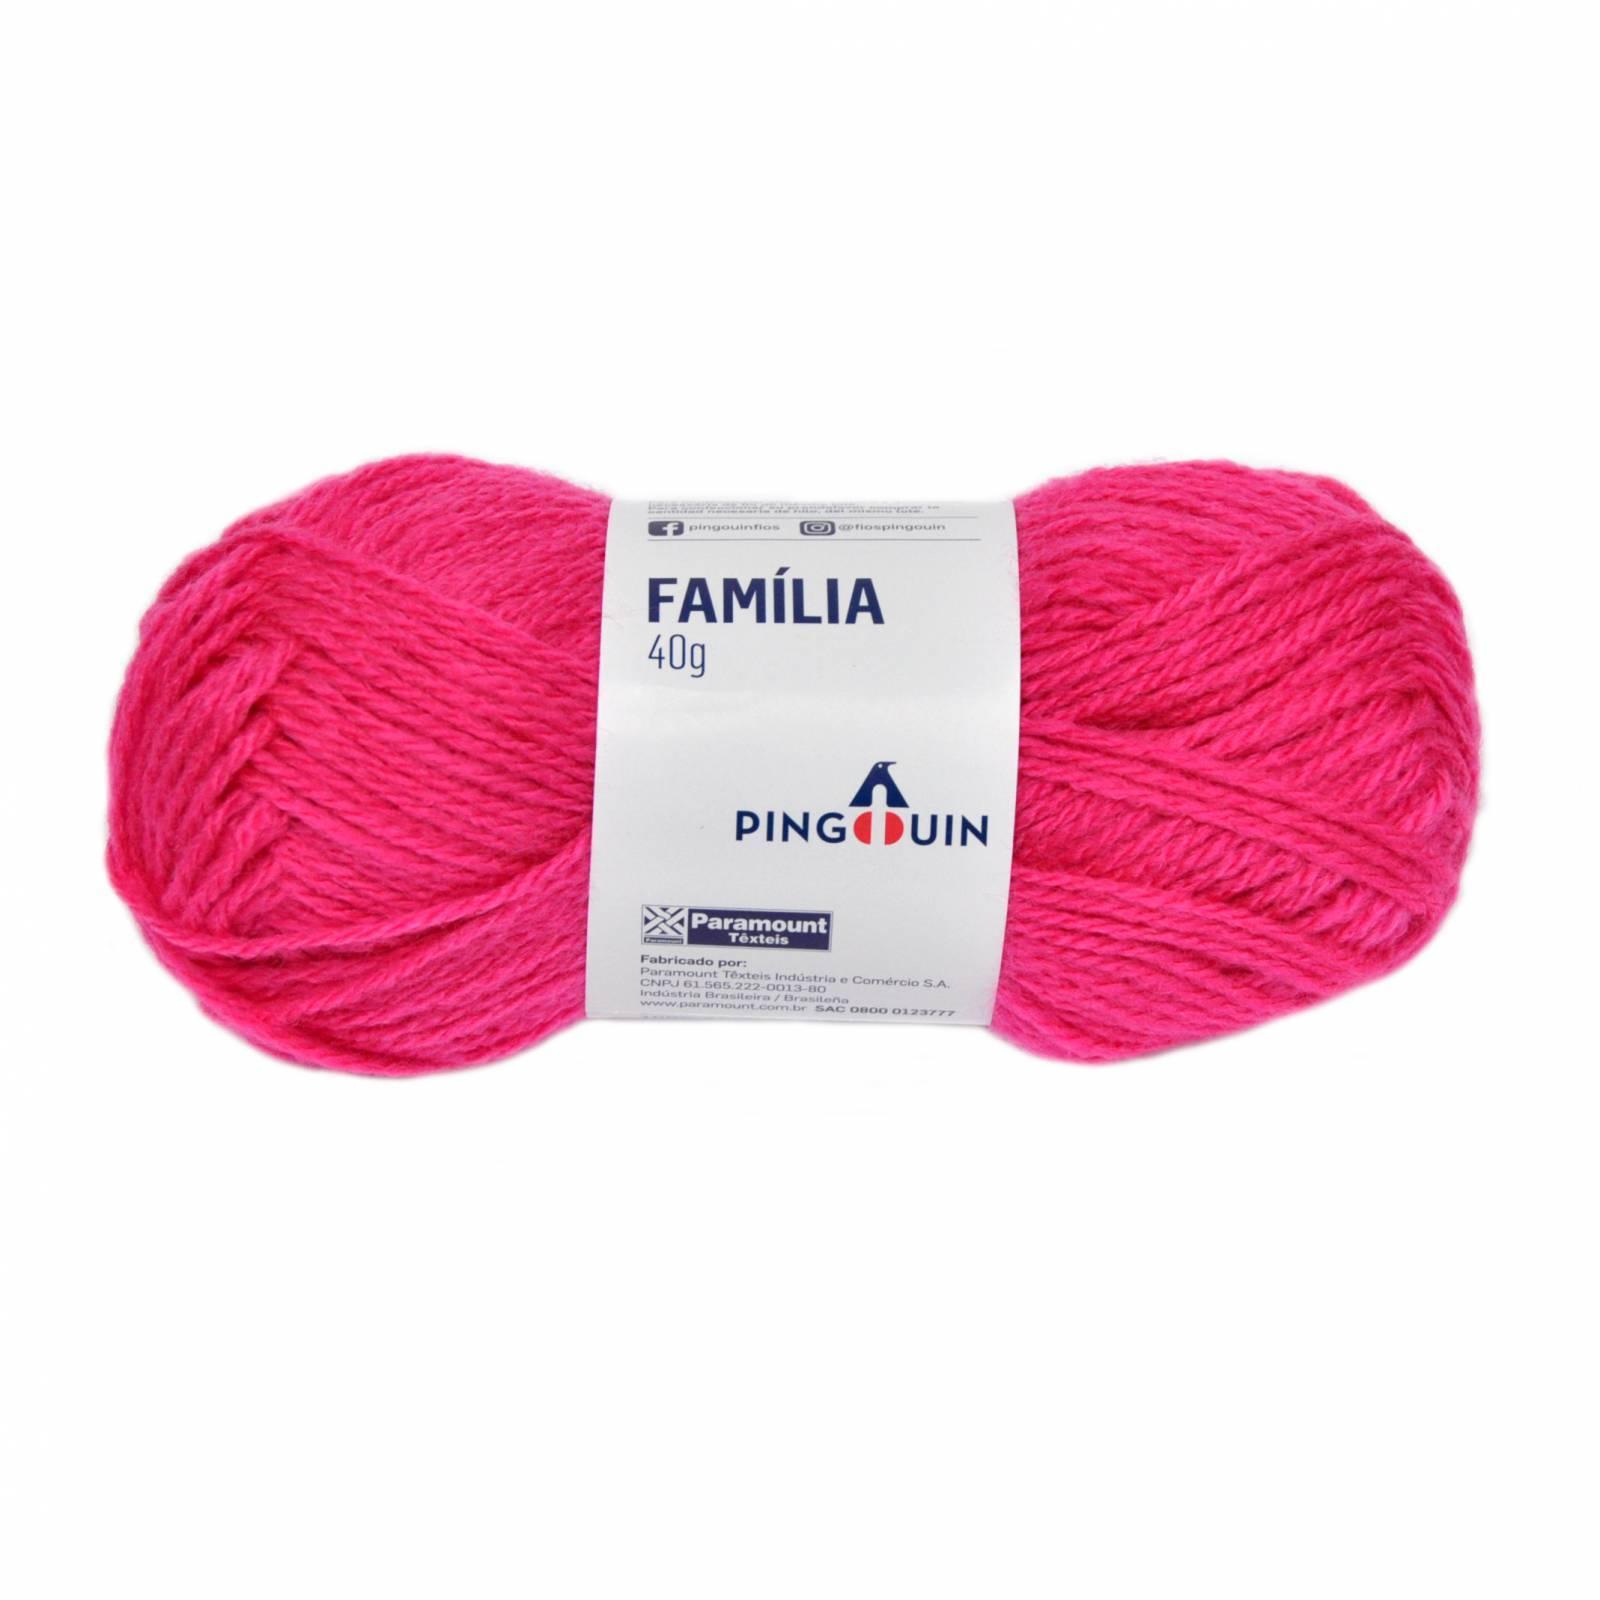 Lã família 2357 pink panther - BAÚ DA VOVÓ